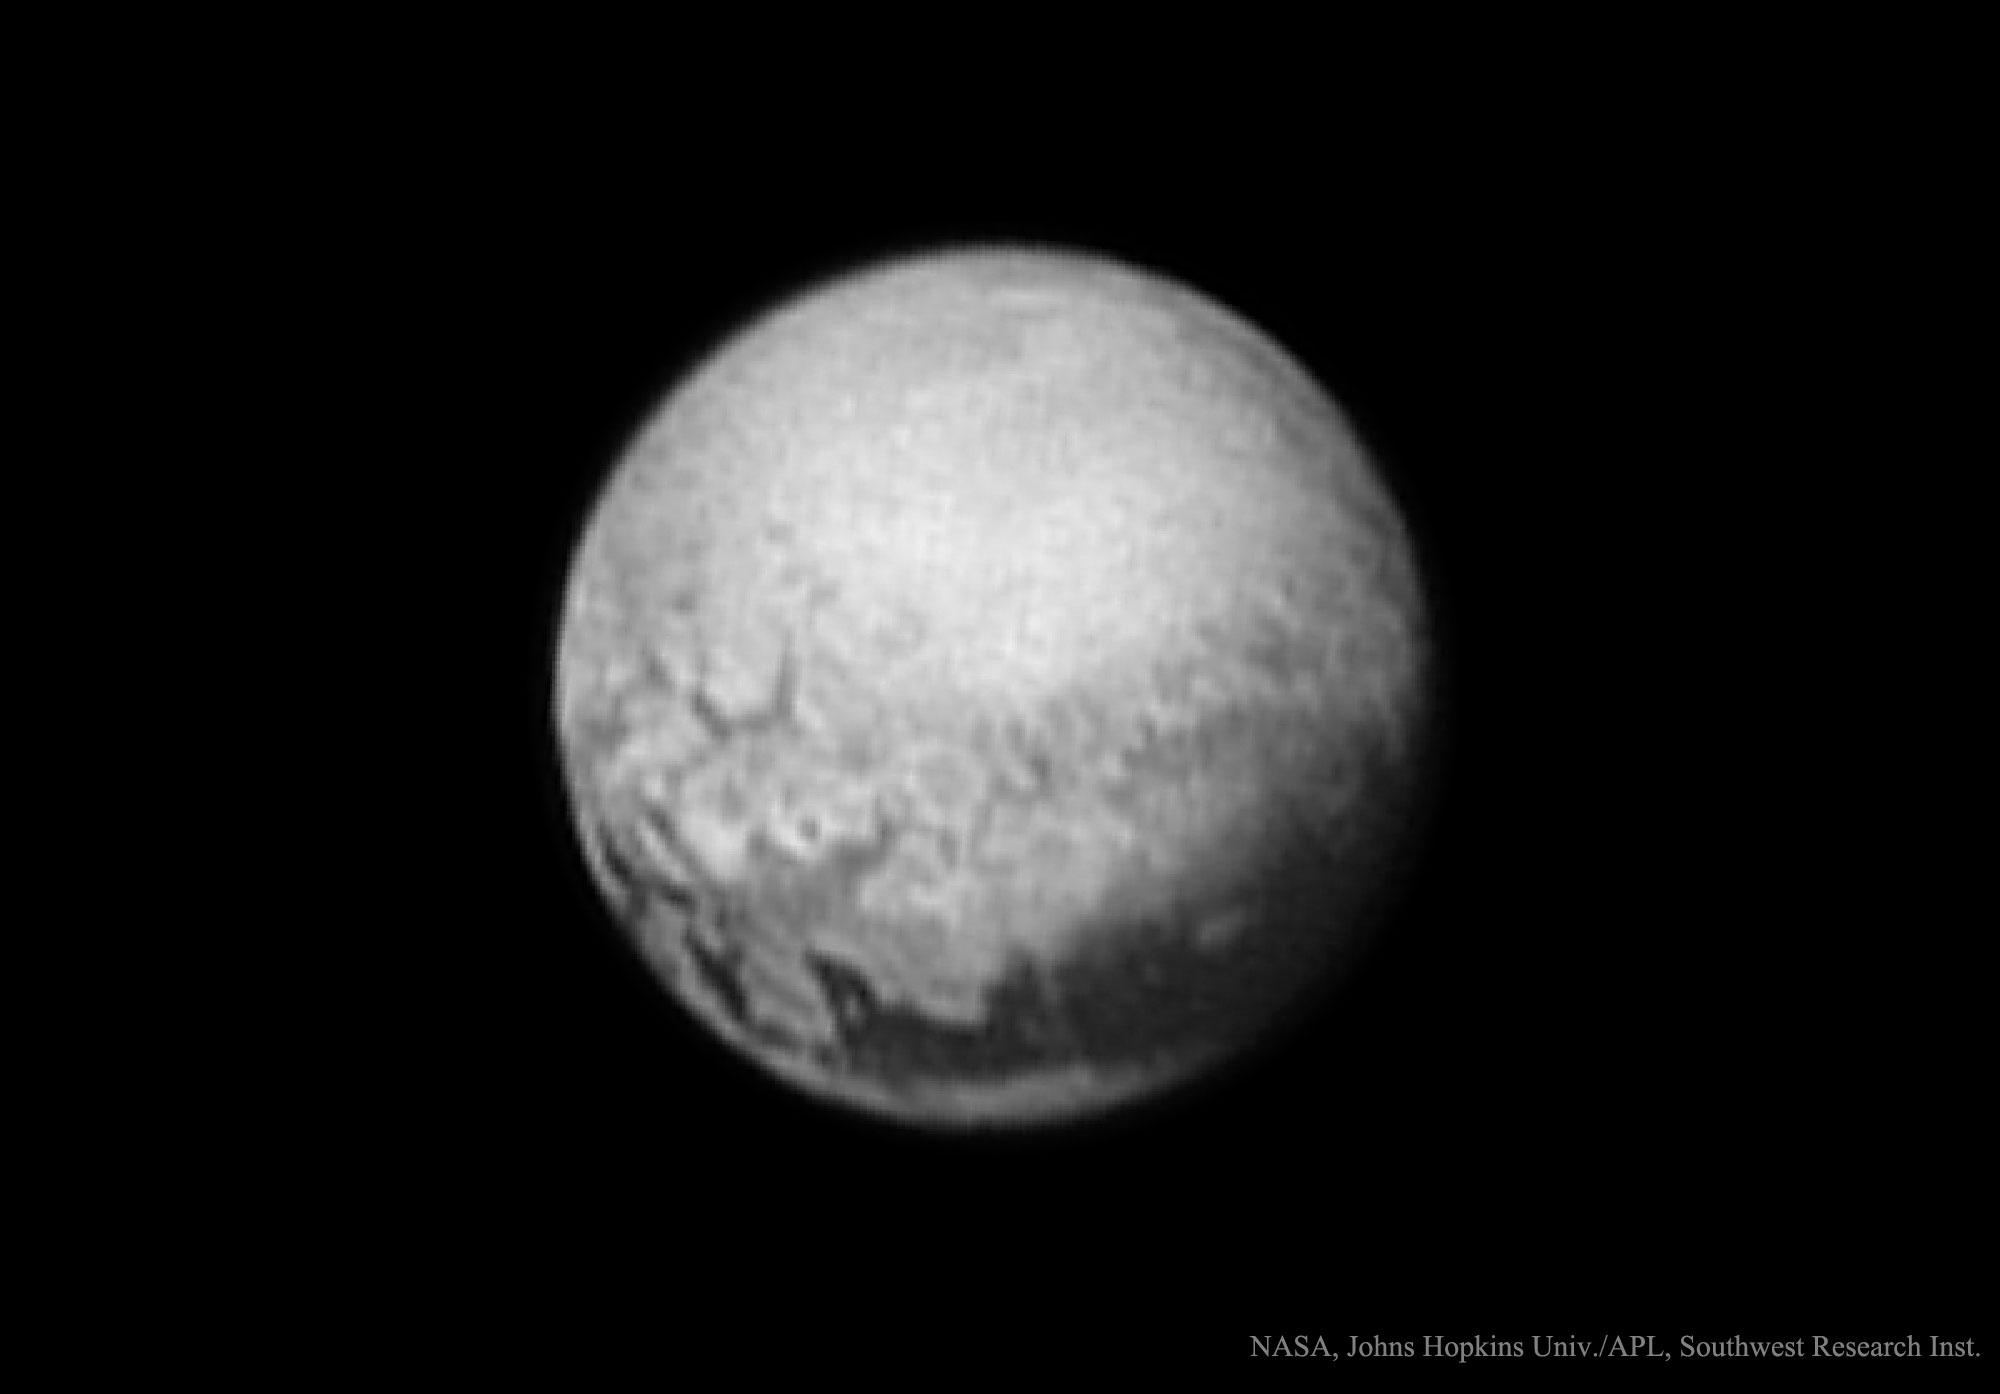 Créditos da imaxe: NASA, Johns Hopkins Univ./APL, Southwest Research Inst.